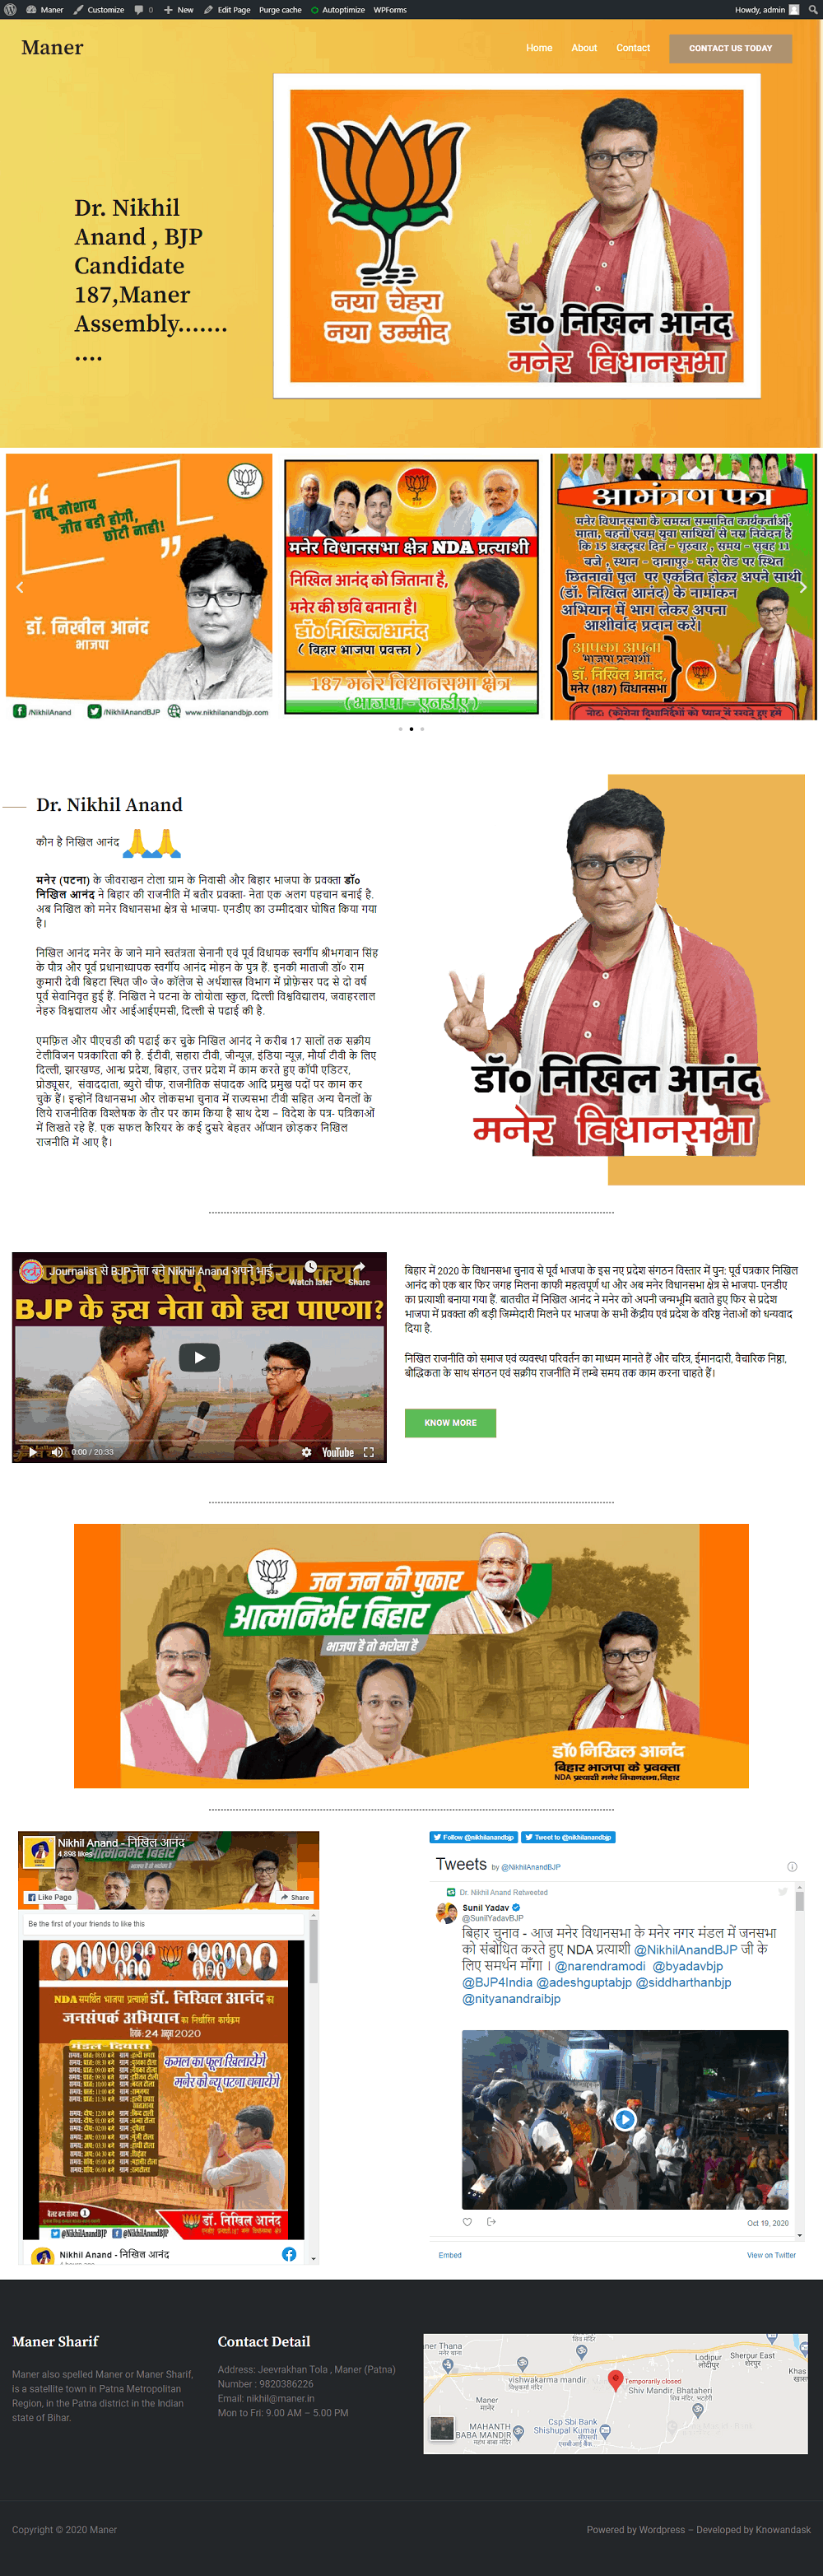 Maner Political Website Development work